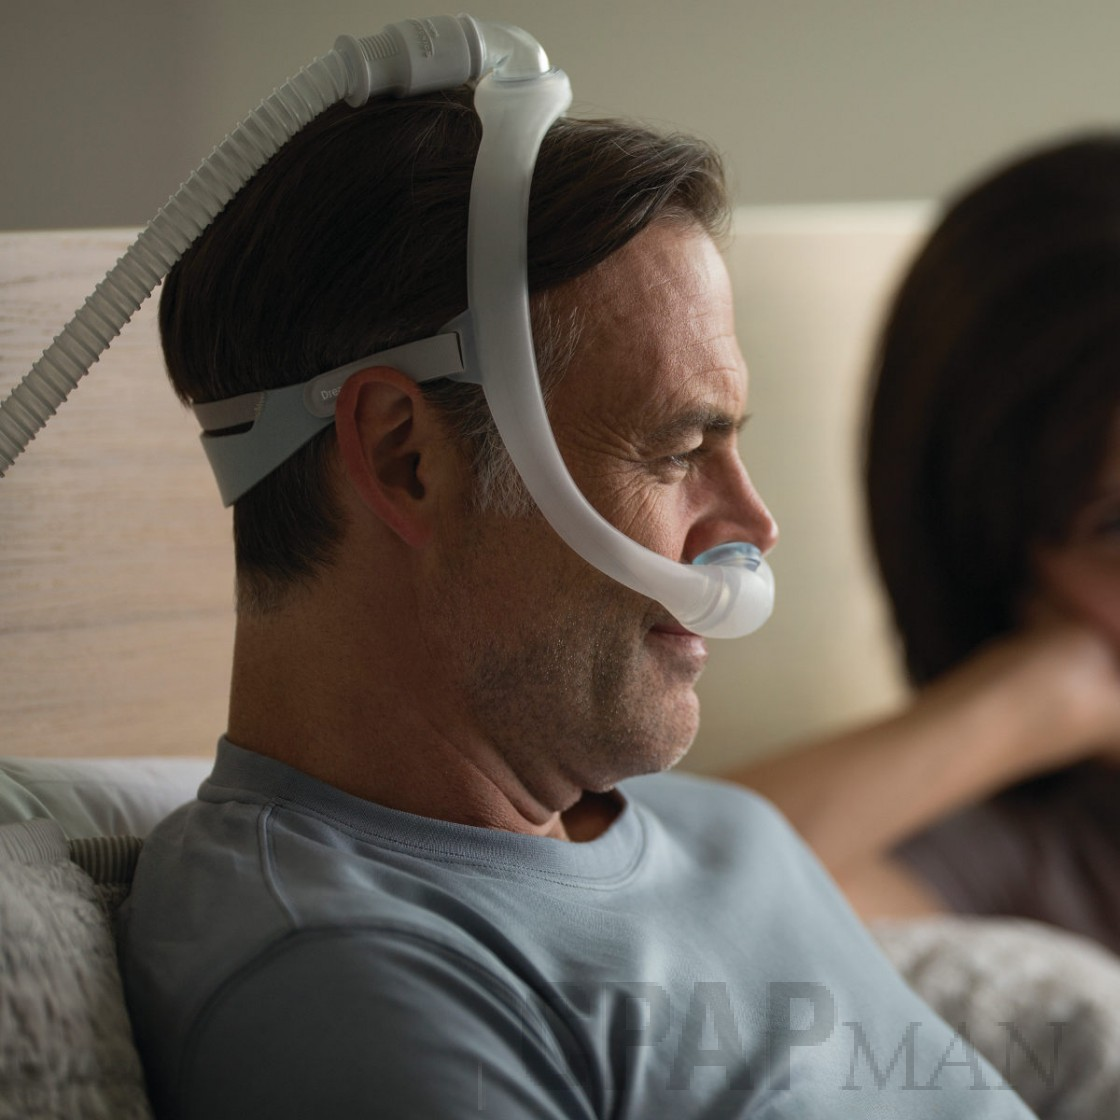 philips dreamwear nasal pillow online